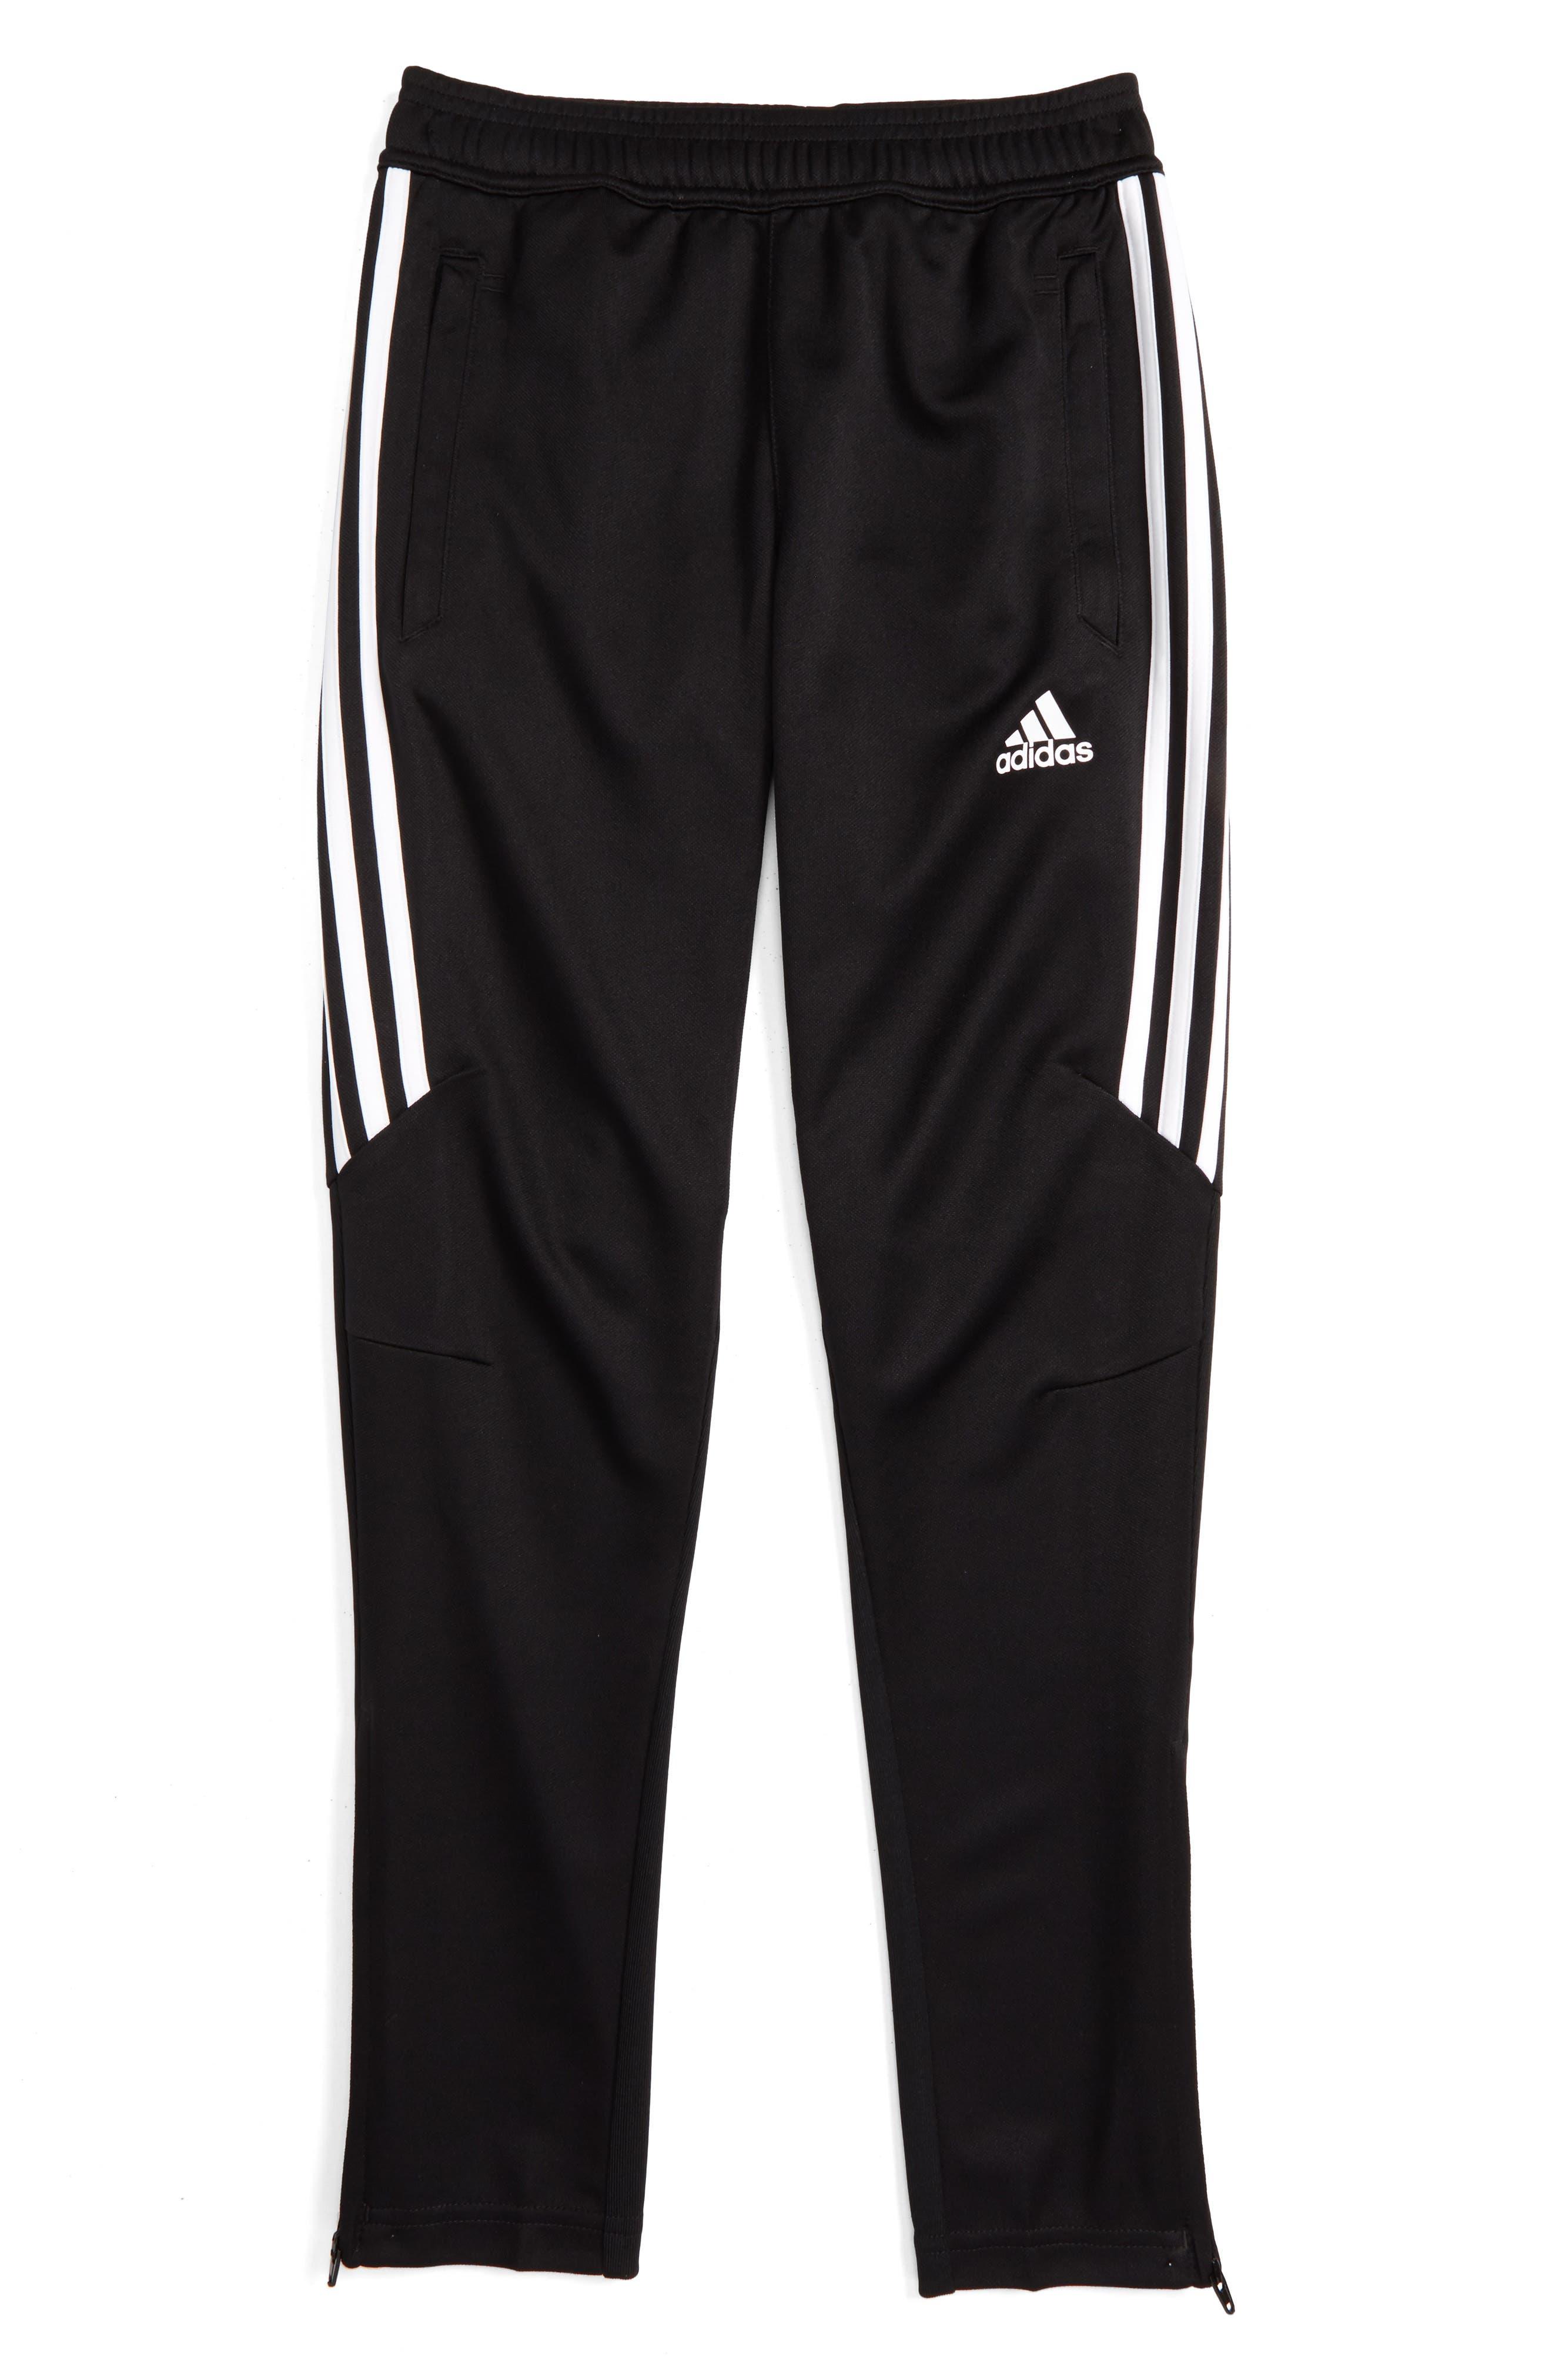 ADIDAS ORIGINALS, Tiro 17 Training Pants, Main thumbnail 1, color, BLACK/ WHITE/ WHITE